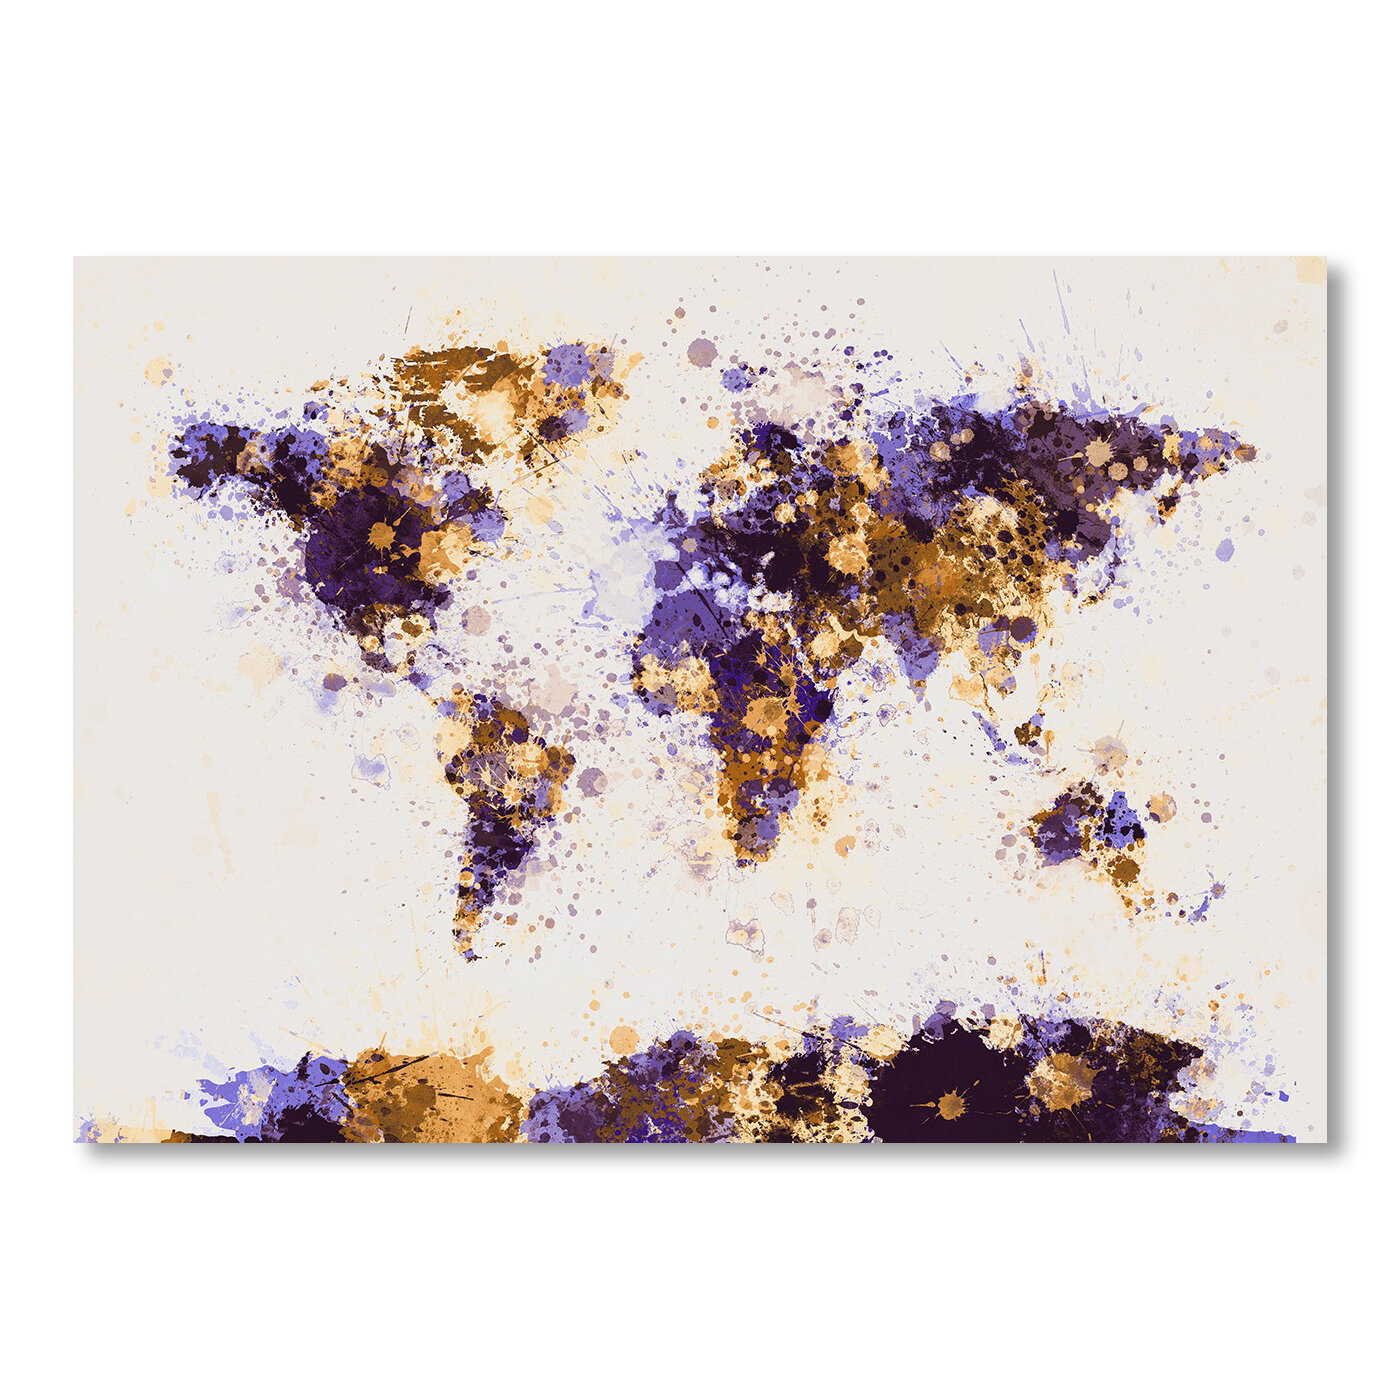 Ebern Designs Lanna World Map Watercolor Wall Mural Wayfair